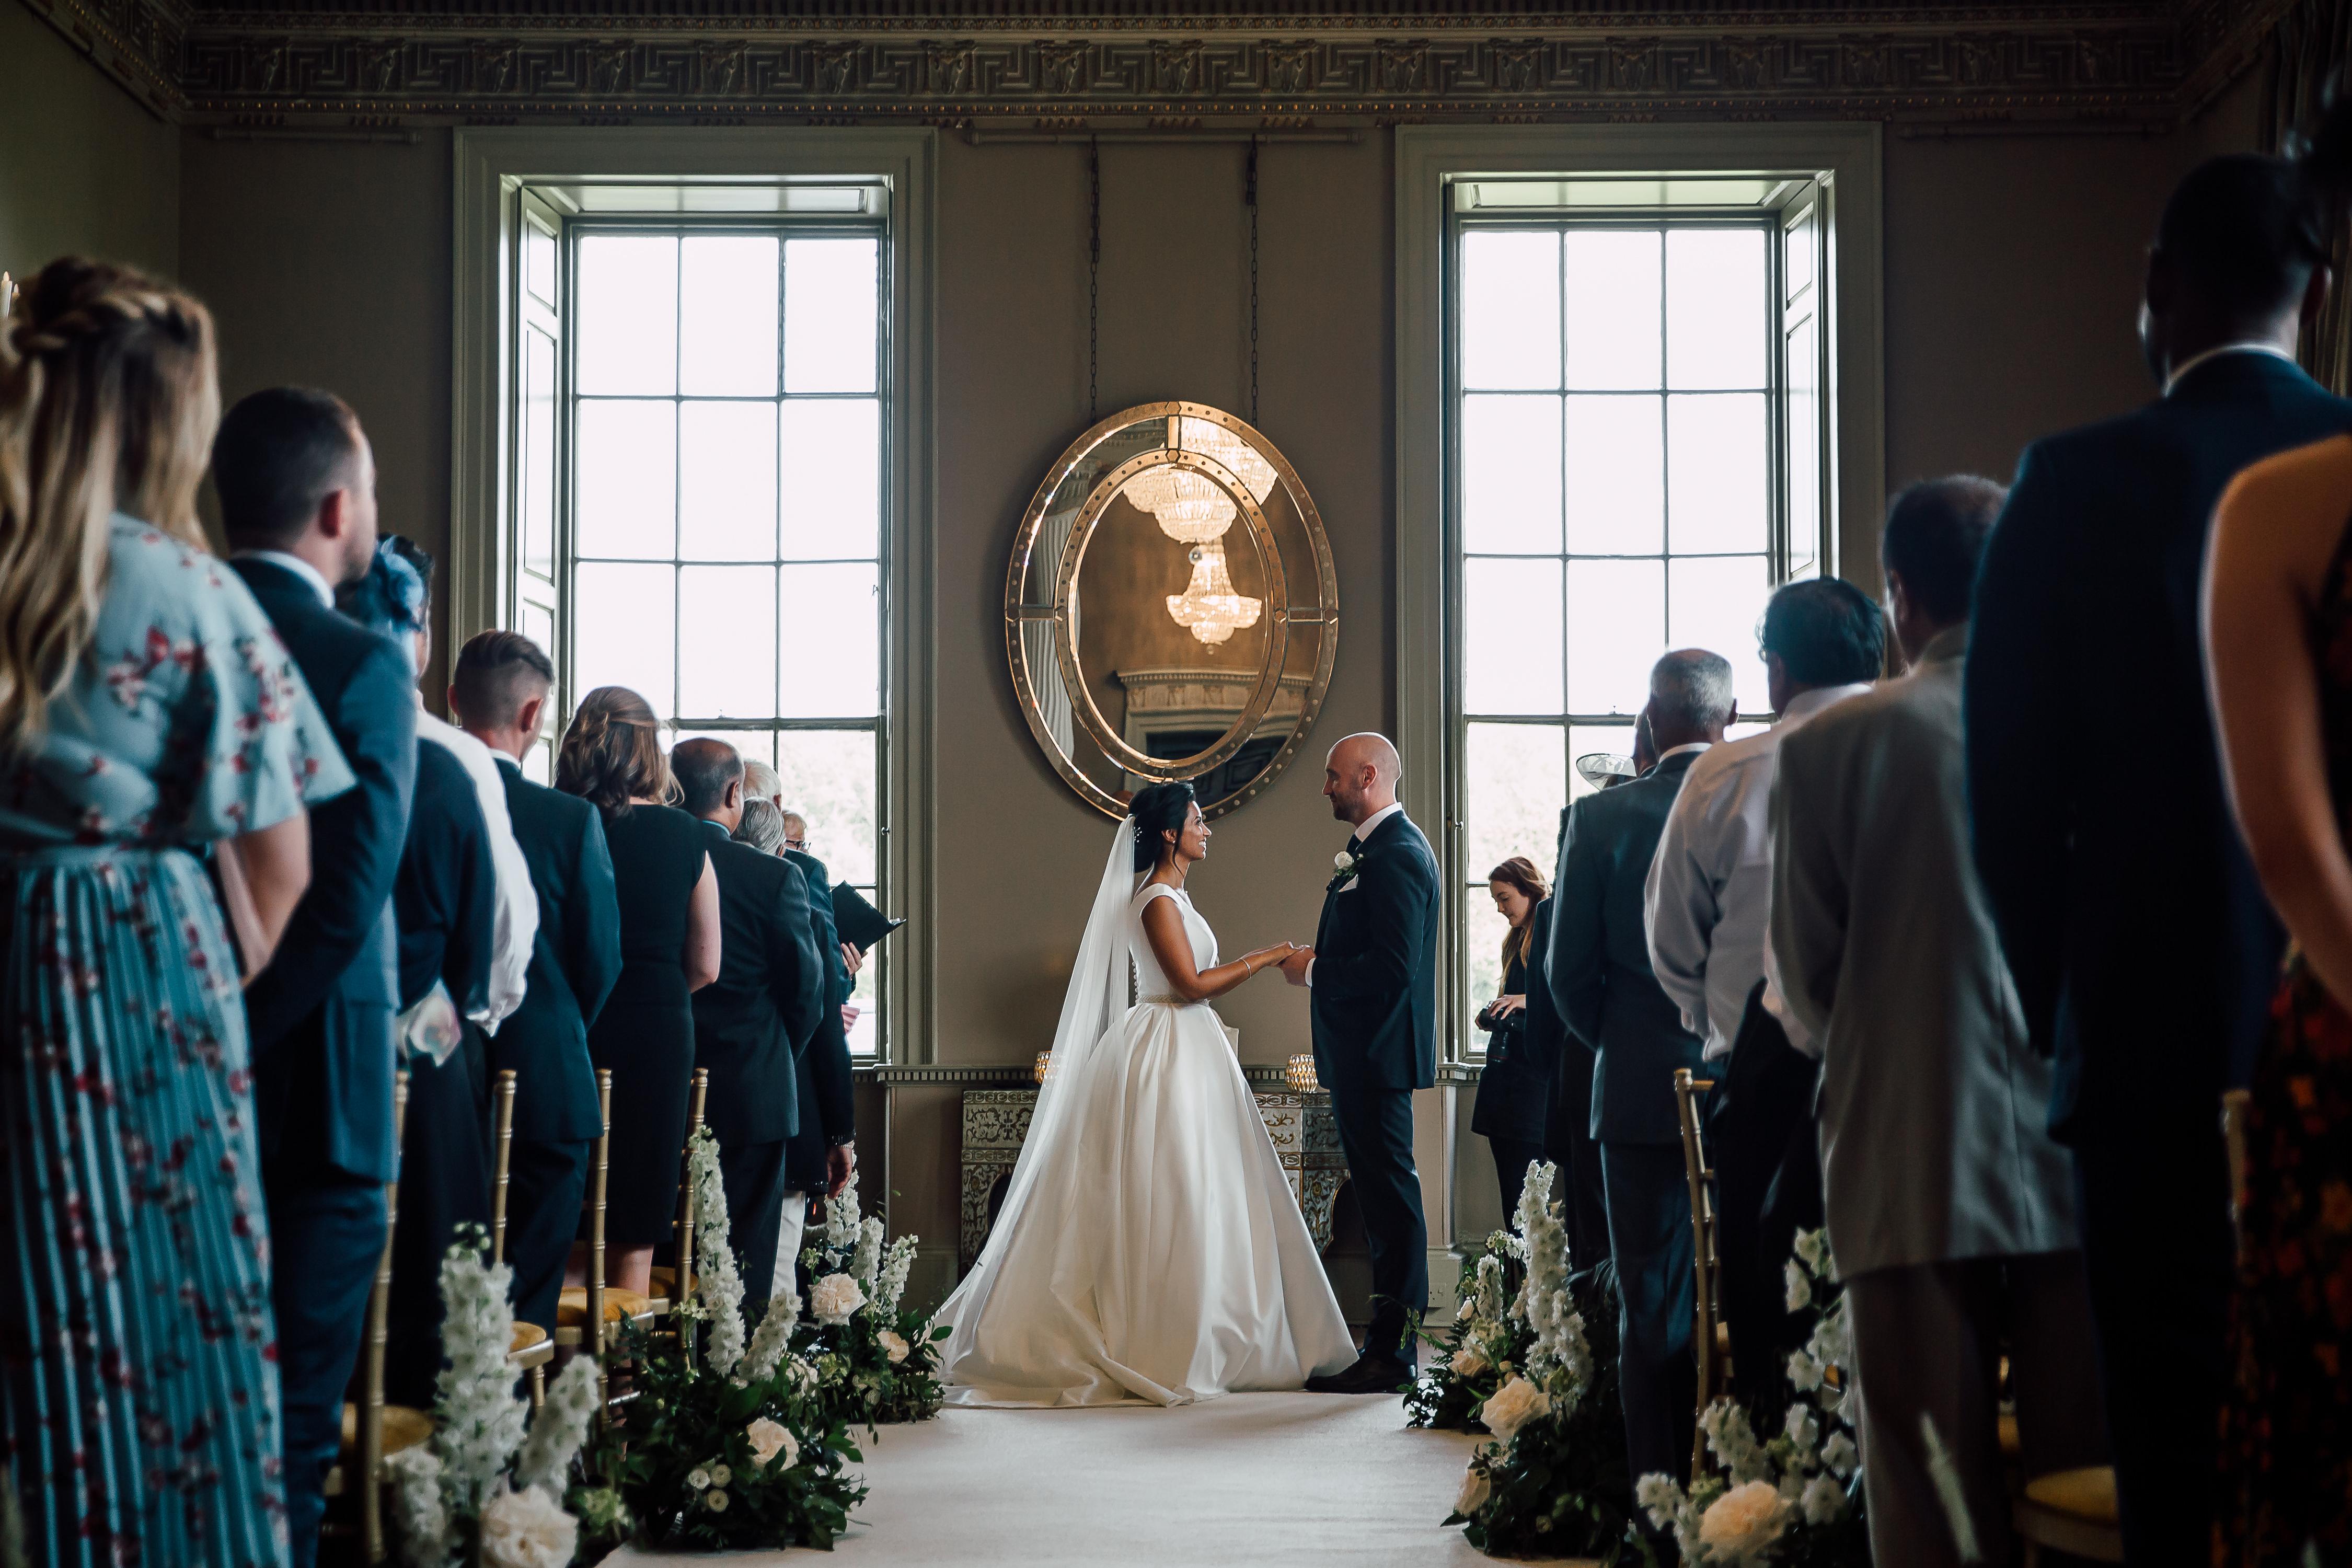 Howshal Hall | Dine Venues | Wedding Ceremony | Anecia & Ben